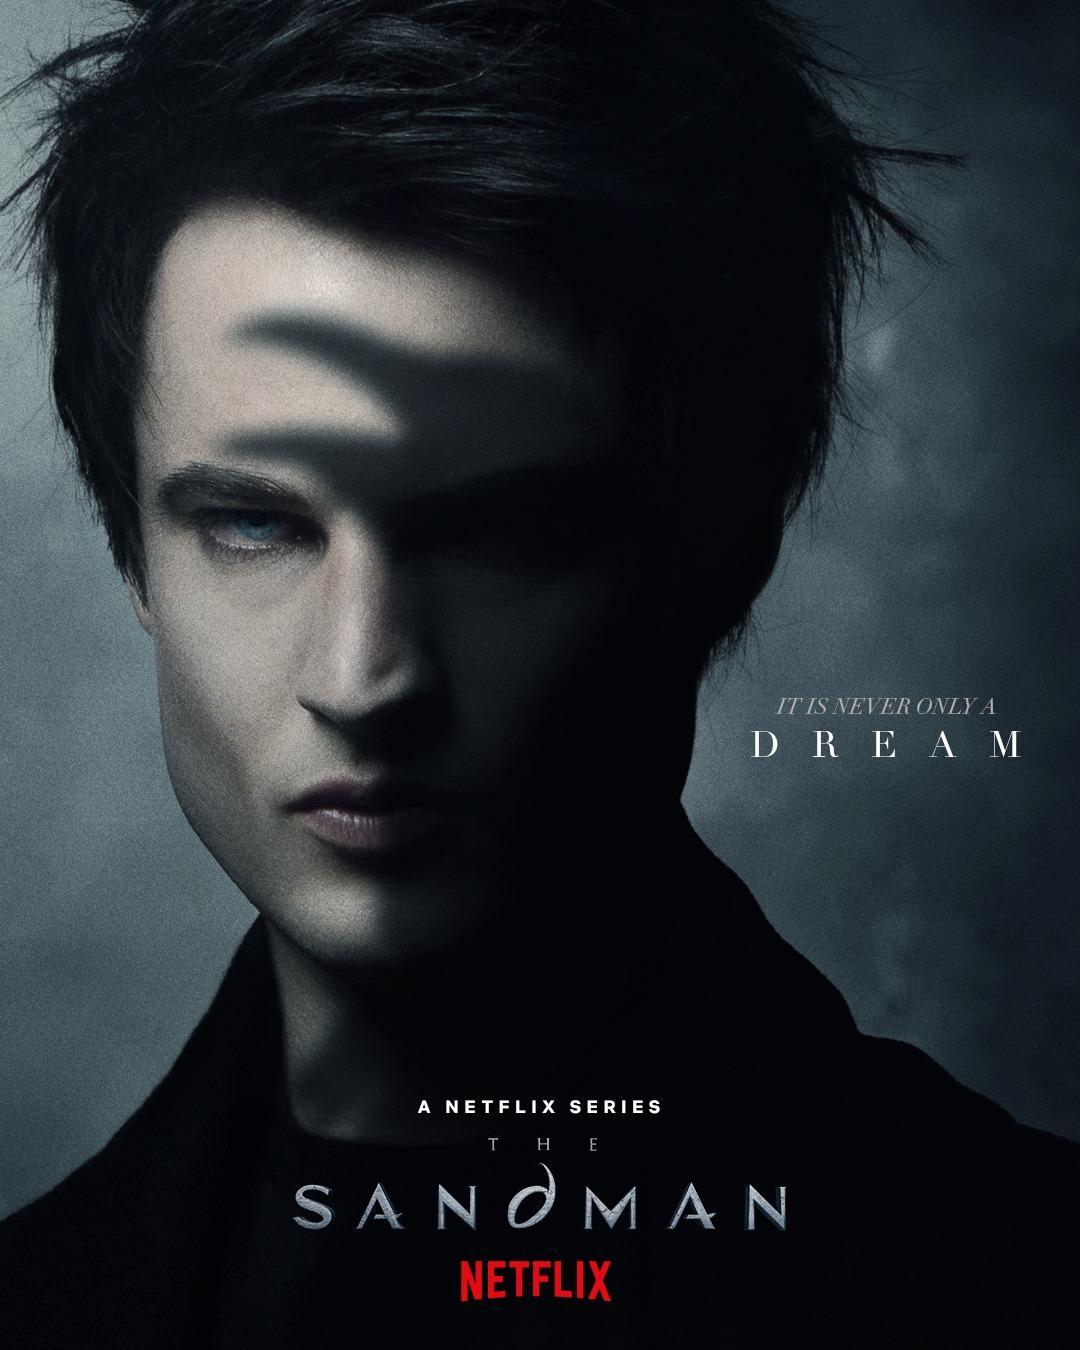 the-sandman-death.jpg